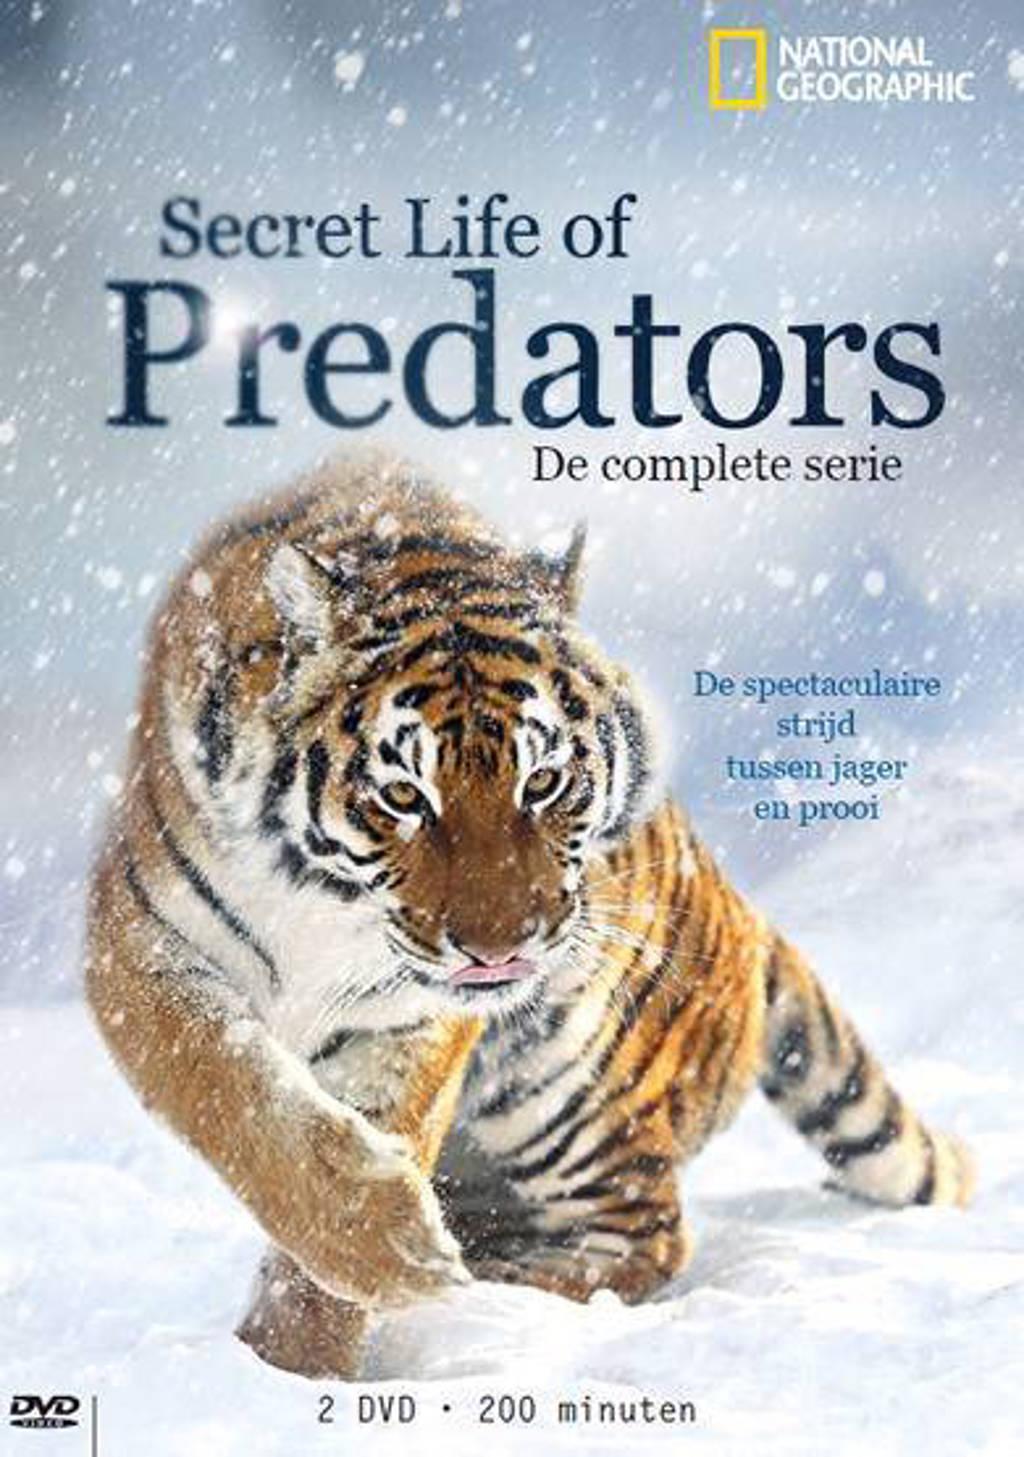 National geographic - Secret life of predators (DVD)